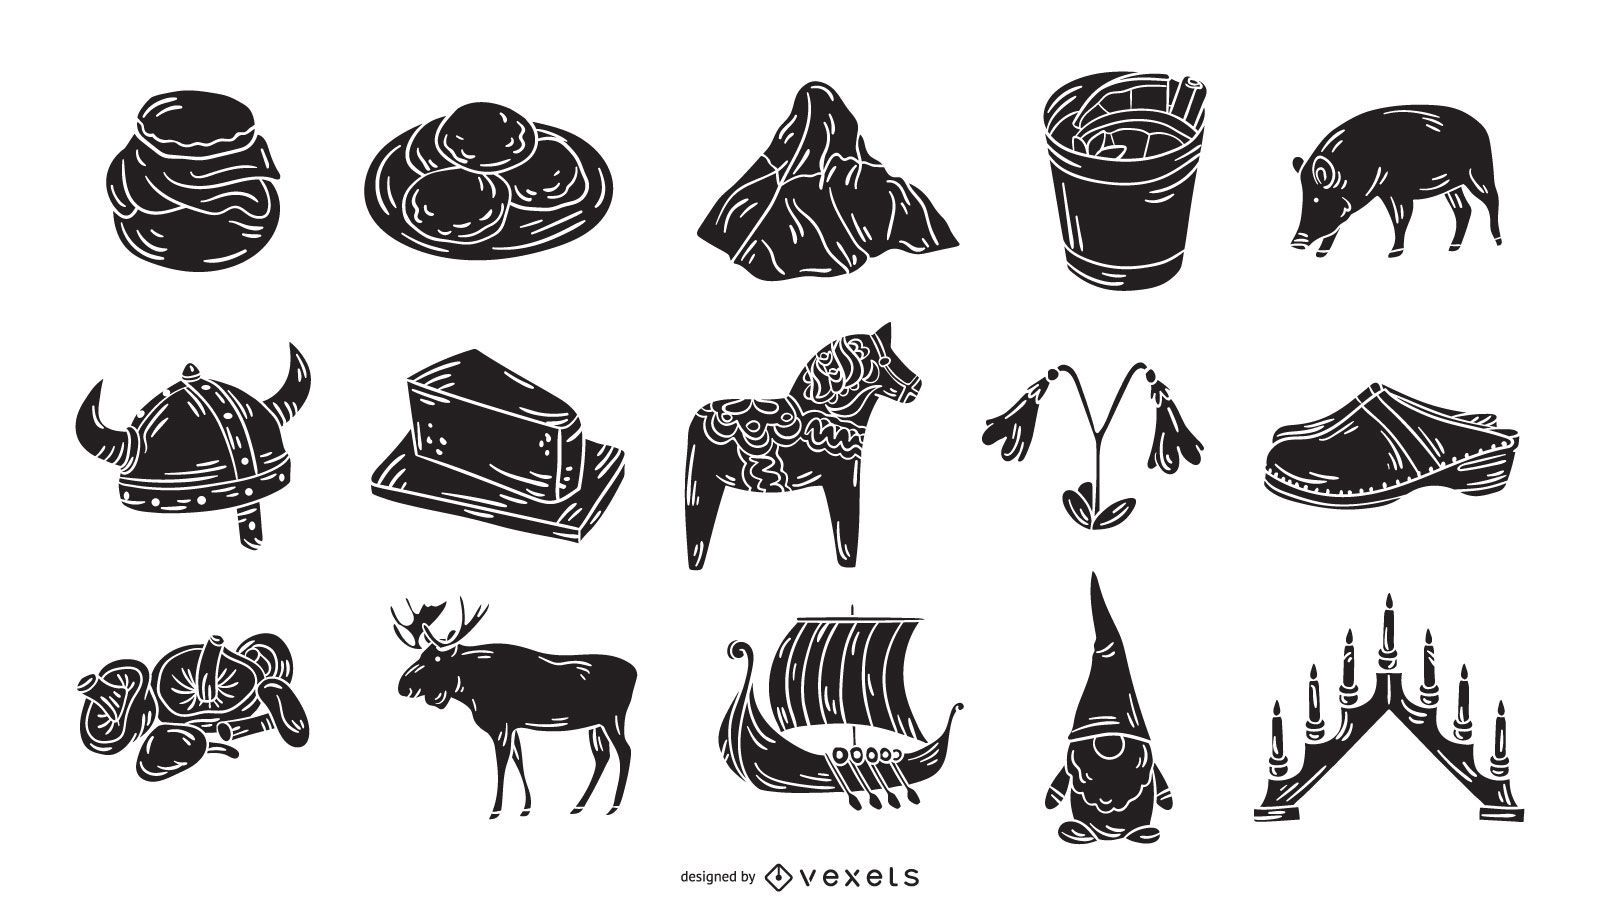 Colección de iconos de silueta de elementos suecos